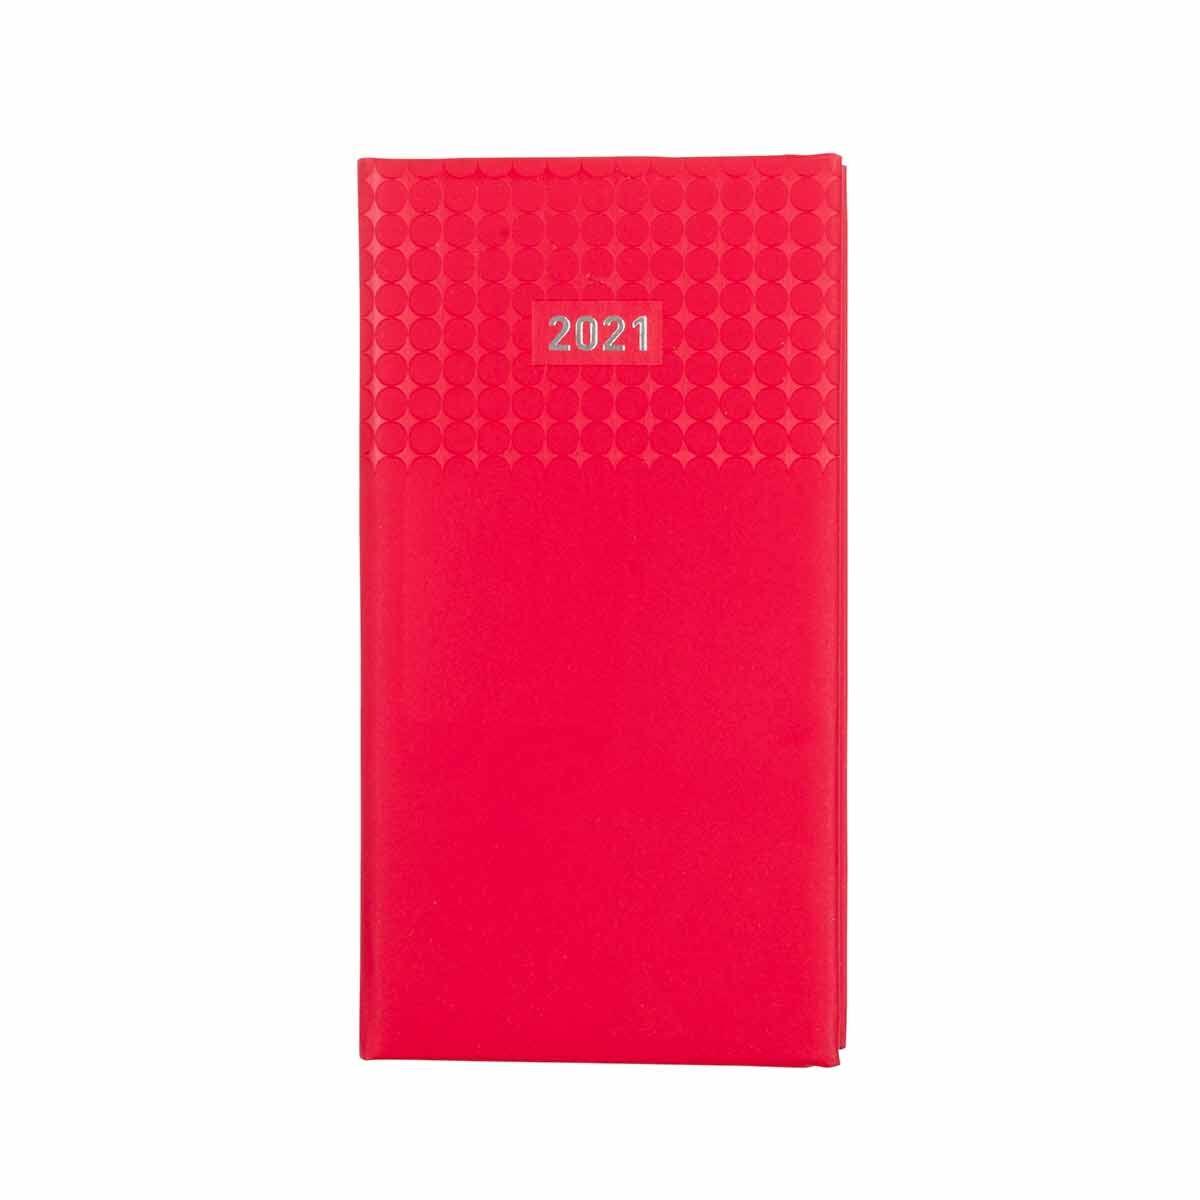 Ryman Langham Diary Day to View Slim 2021 Red